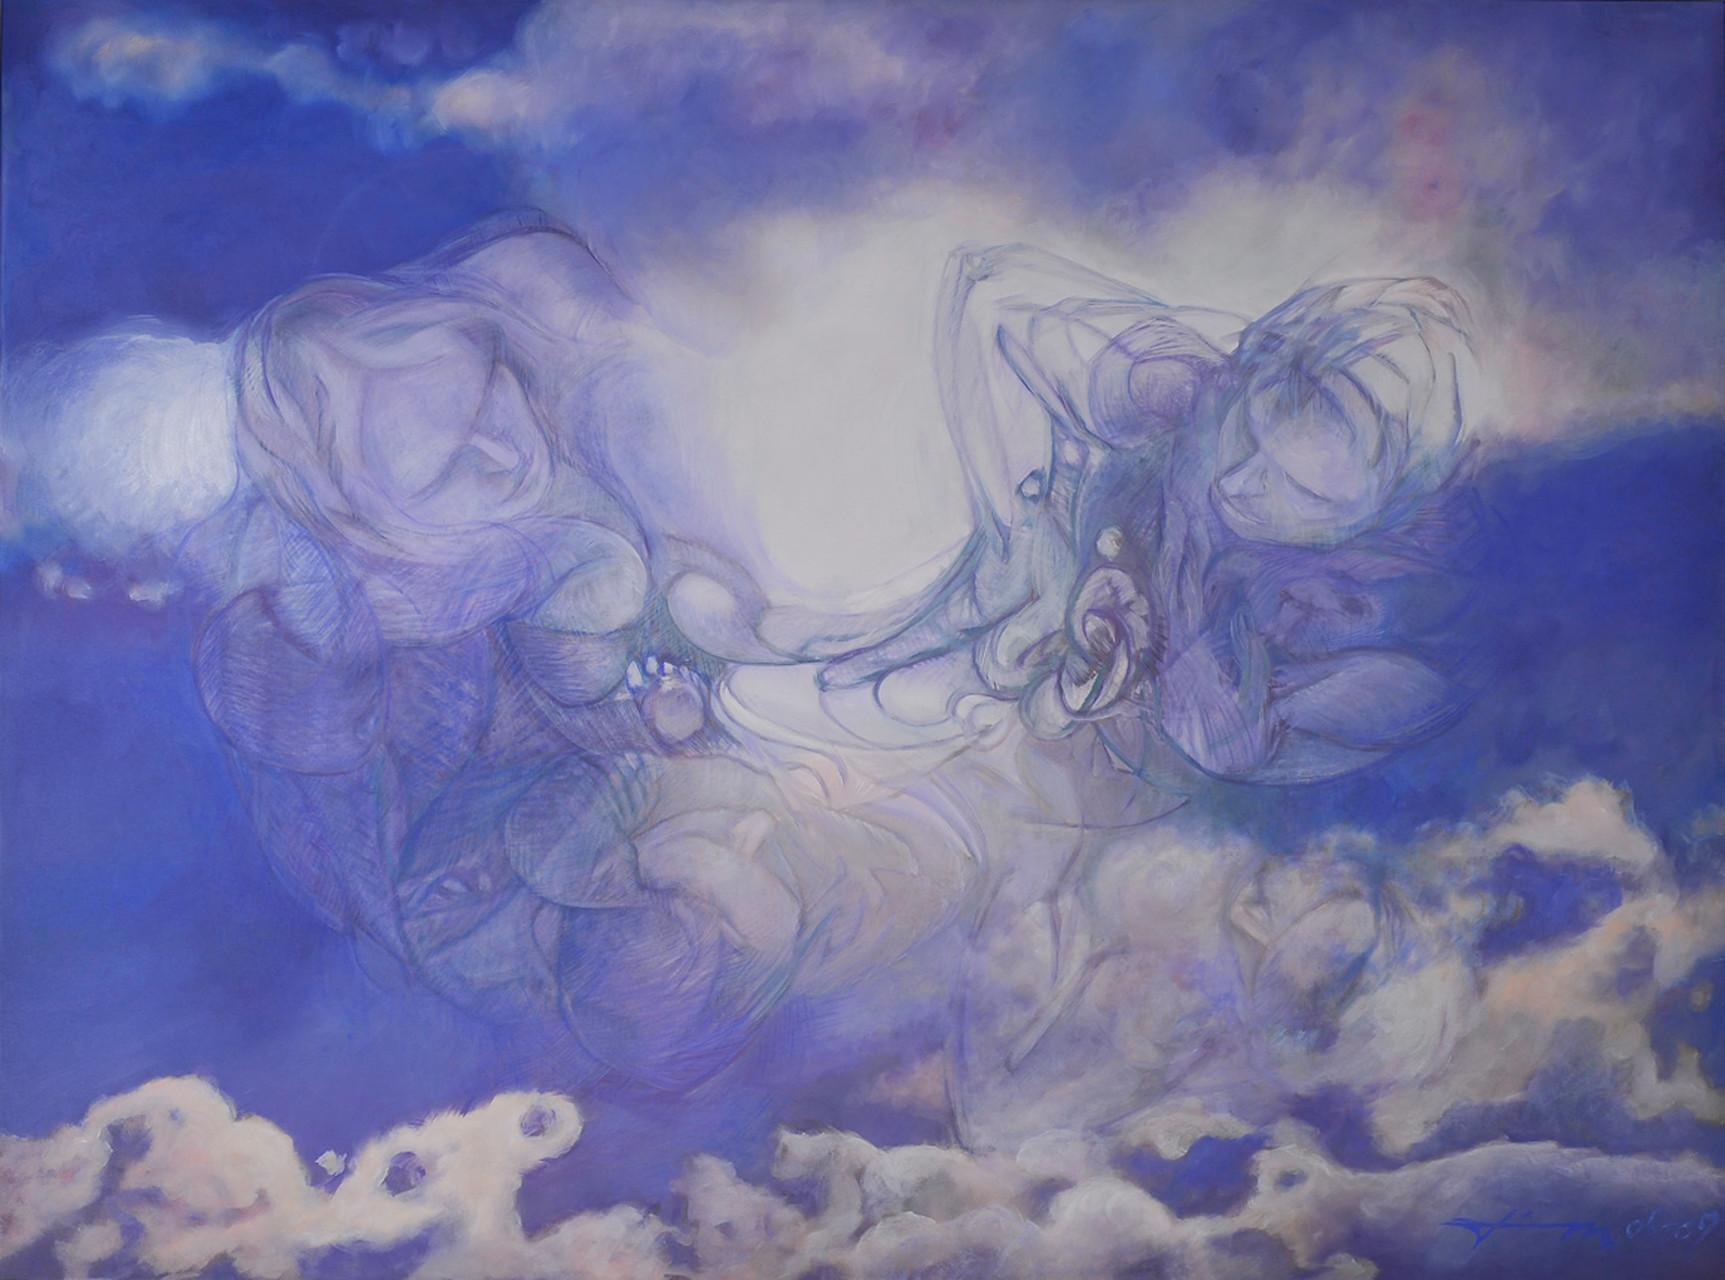 Erleuchtung, Thomas M. Mayrhofer, 2005-2009, 195x145cm, Acryl auf Textil